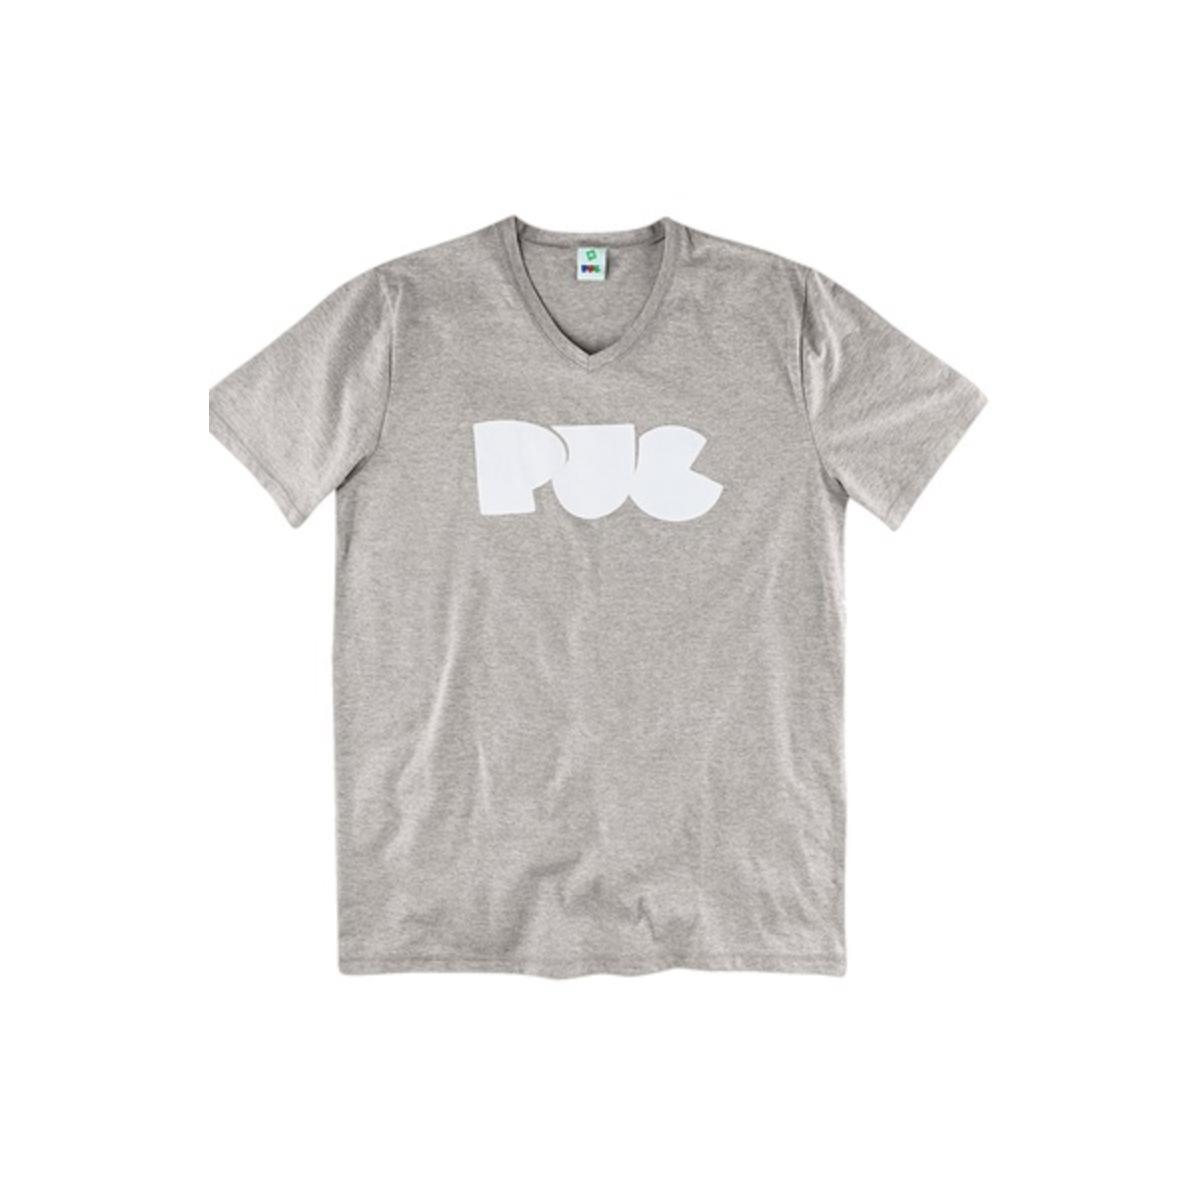 Camiseta Masculina Puc 2h3v M2h10 Mescla